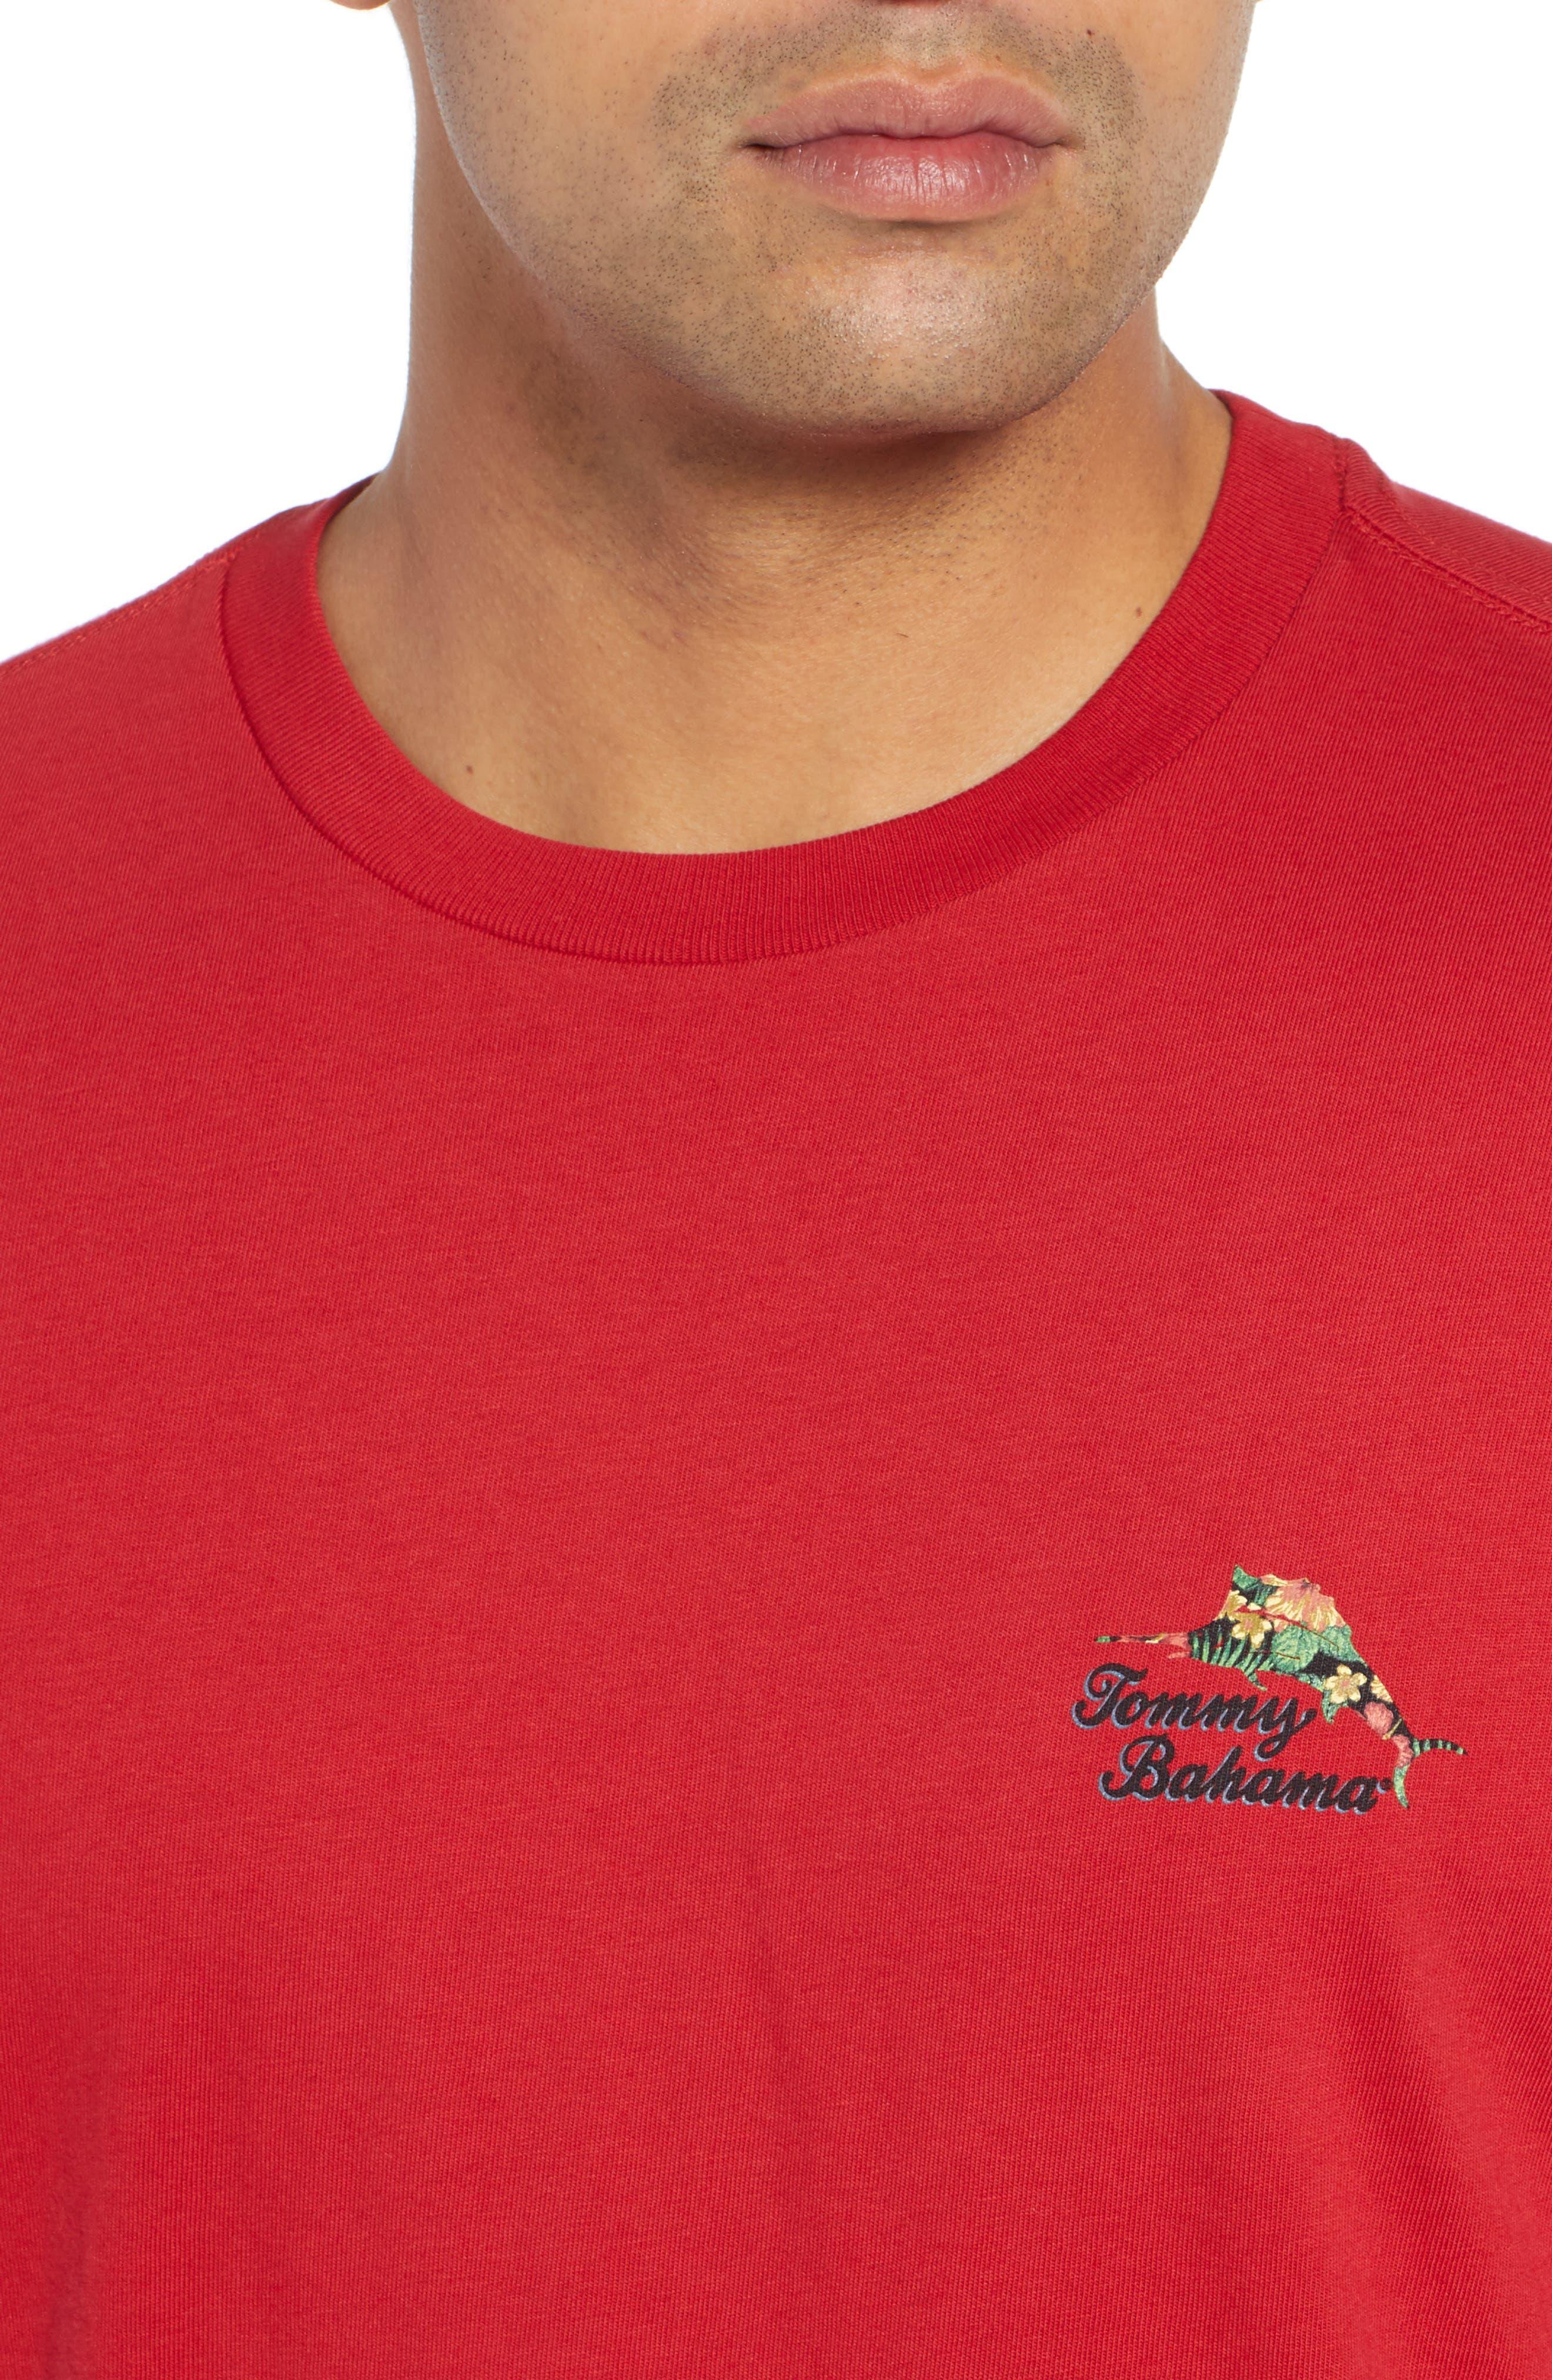 TOMMY BAHAMA, Alo-Ho Ho-Ha Graphic T-Shirt, Alternate thumbnail 4, color, SCOOTER RED